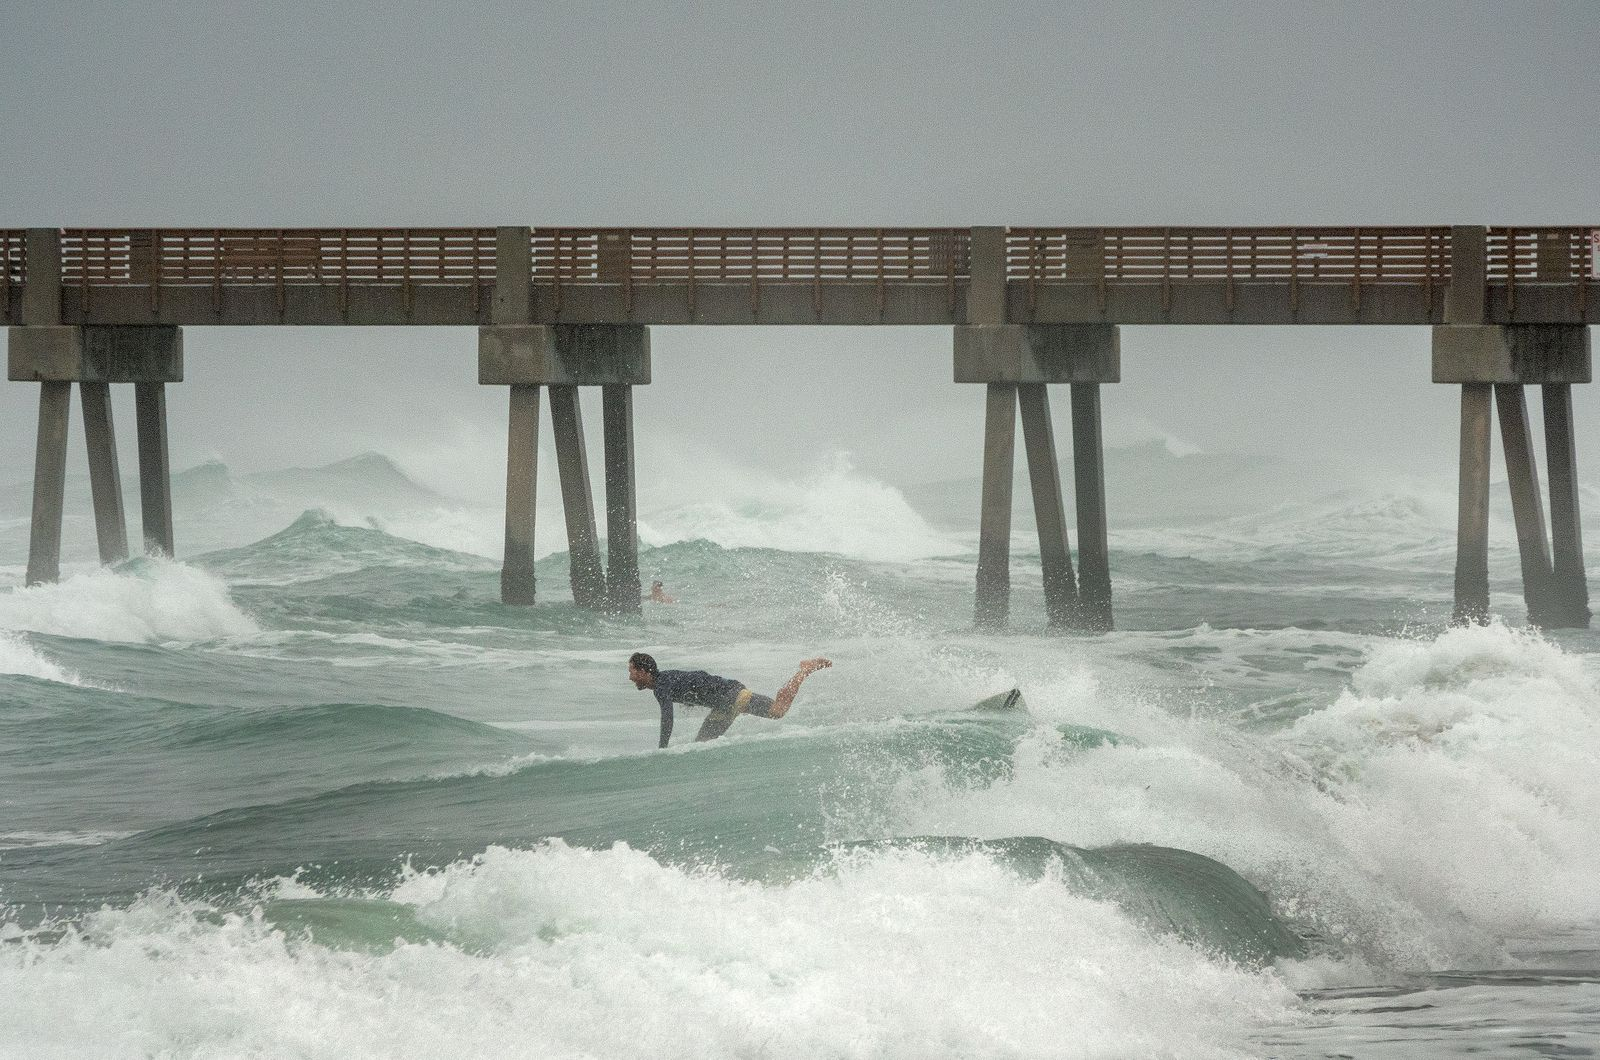 Storm Isaias passes by Florida's shores, Juno Beach, USA - 02 Aug 2020